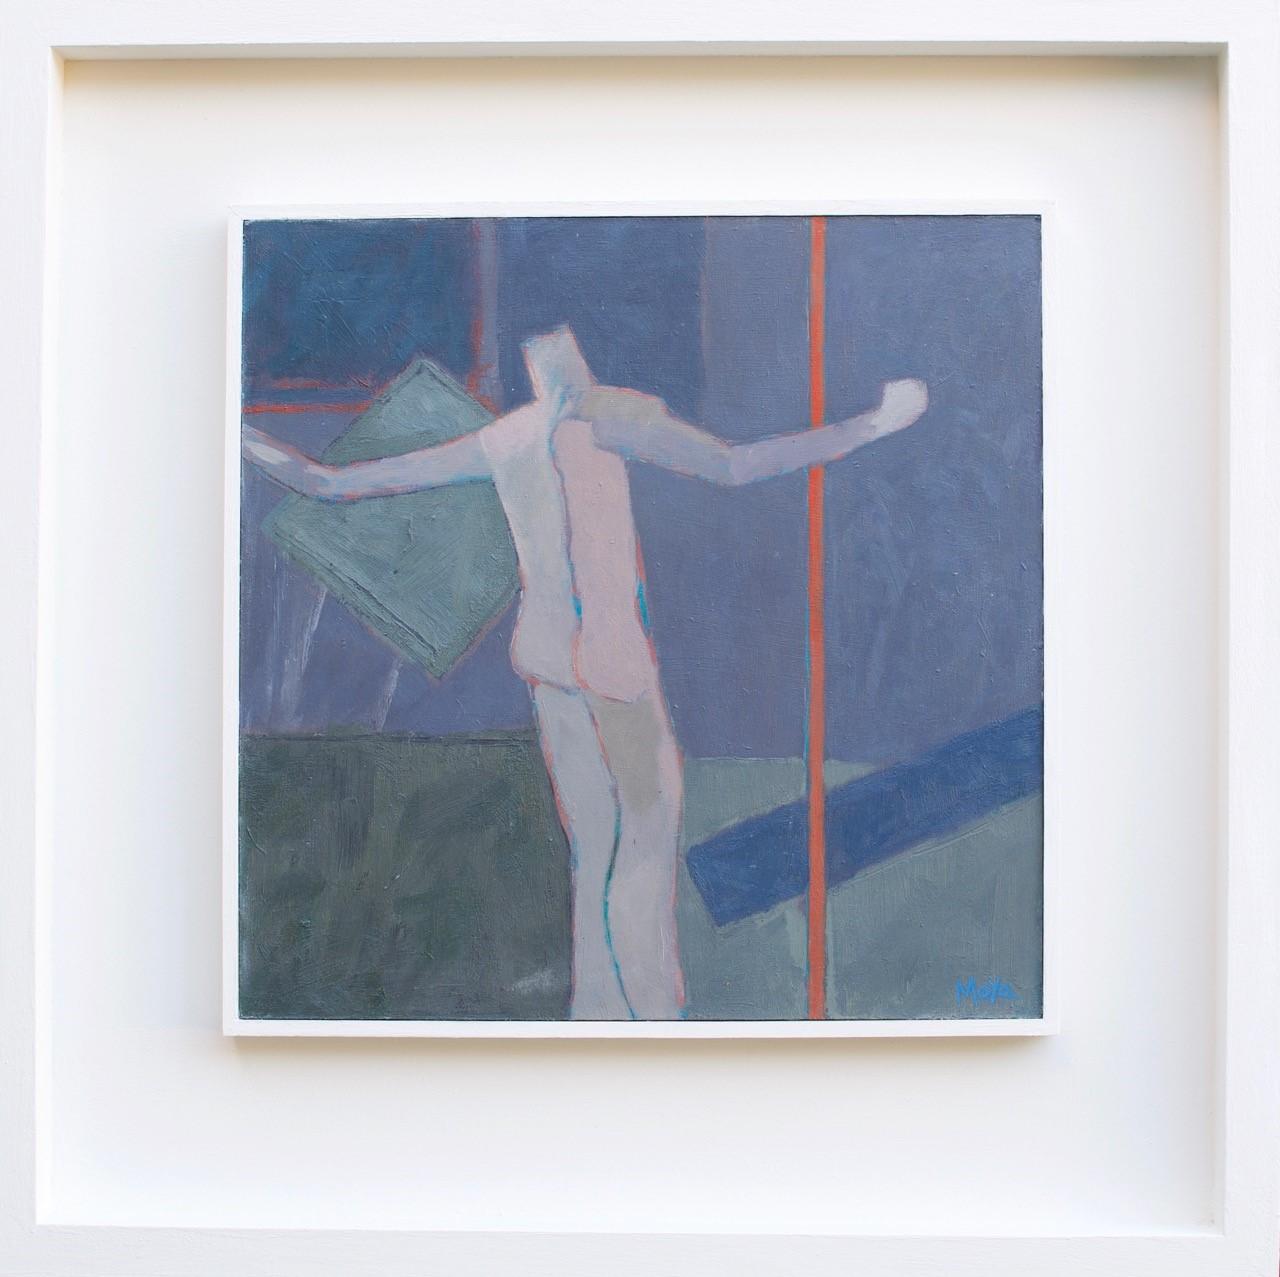 Dance  acrylic on board  31.5 x 31.5cm framed  £495